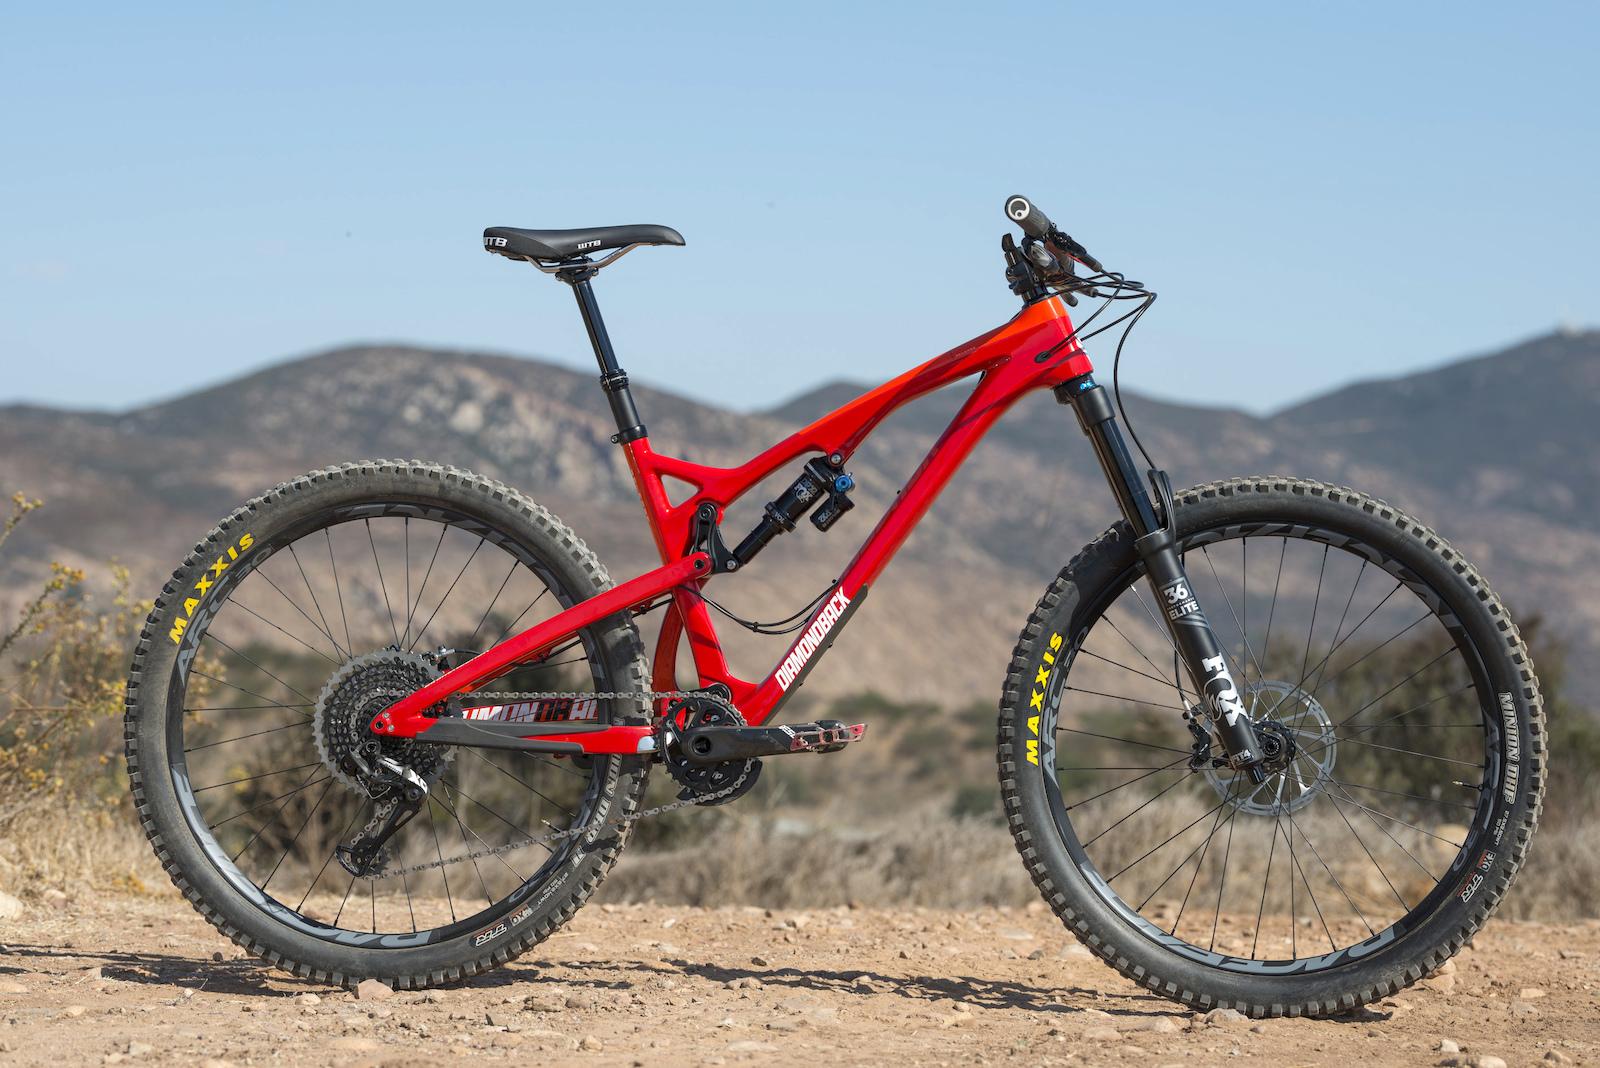 186e99f78 Diamondback s Carbon Release 5c – Review - Pinkbike